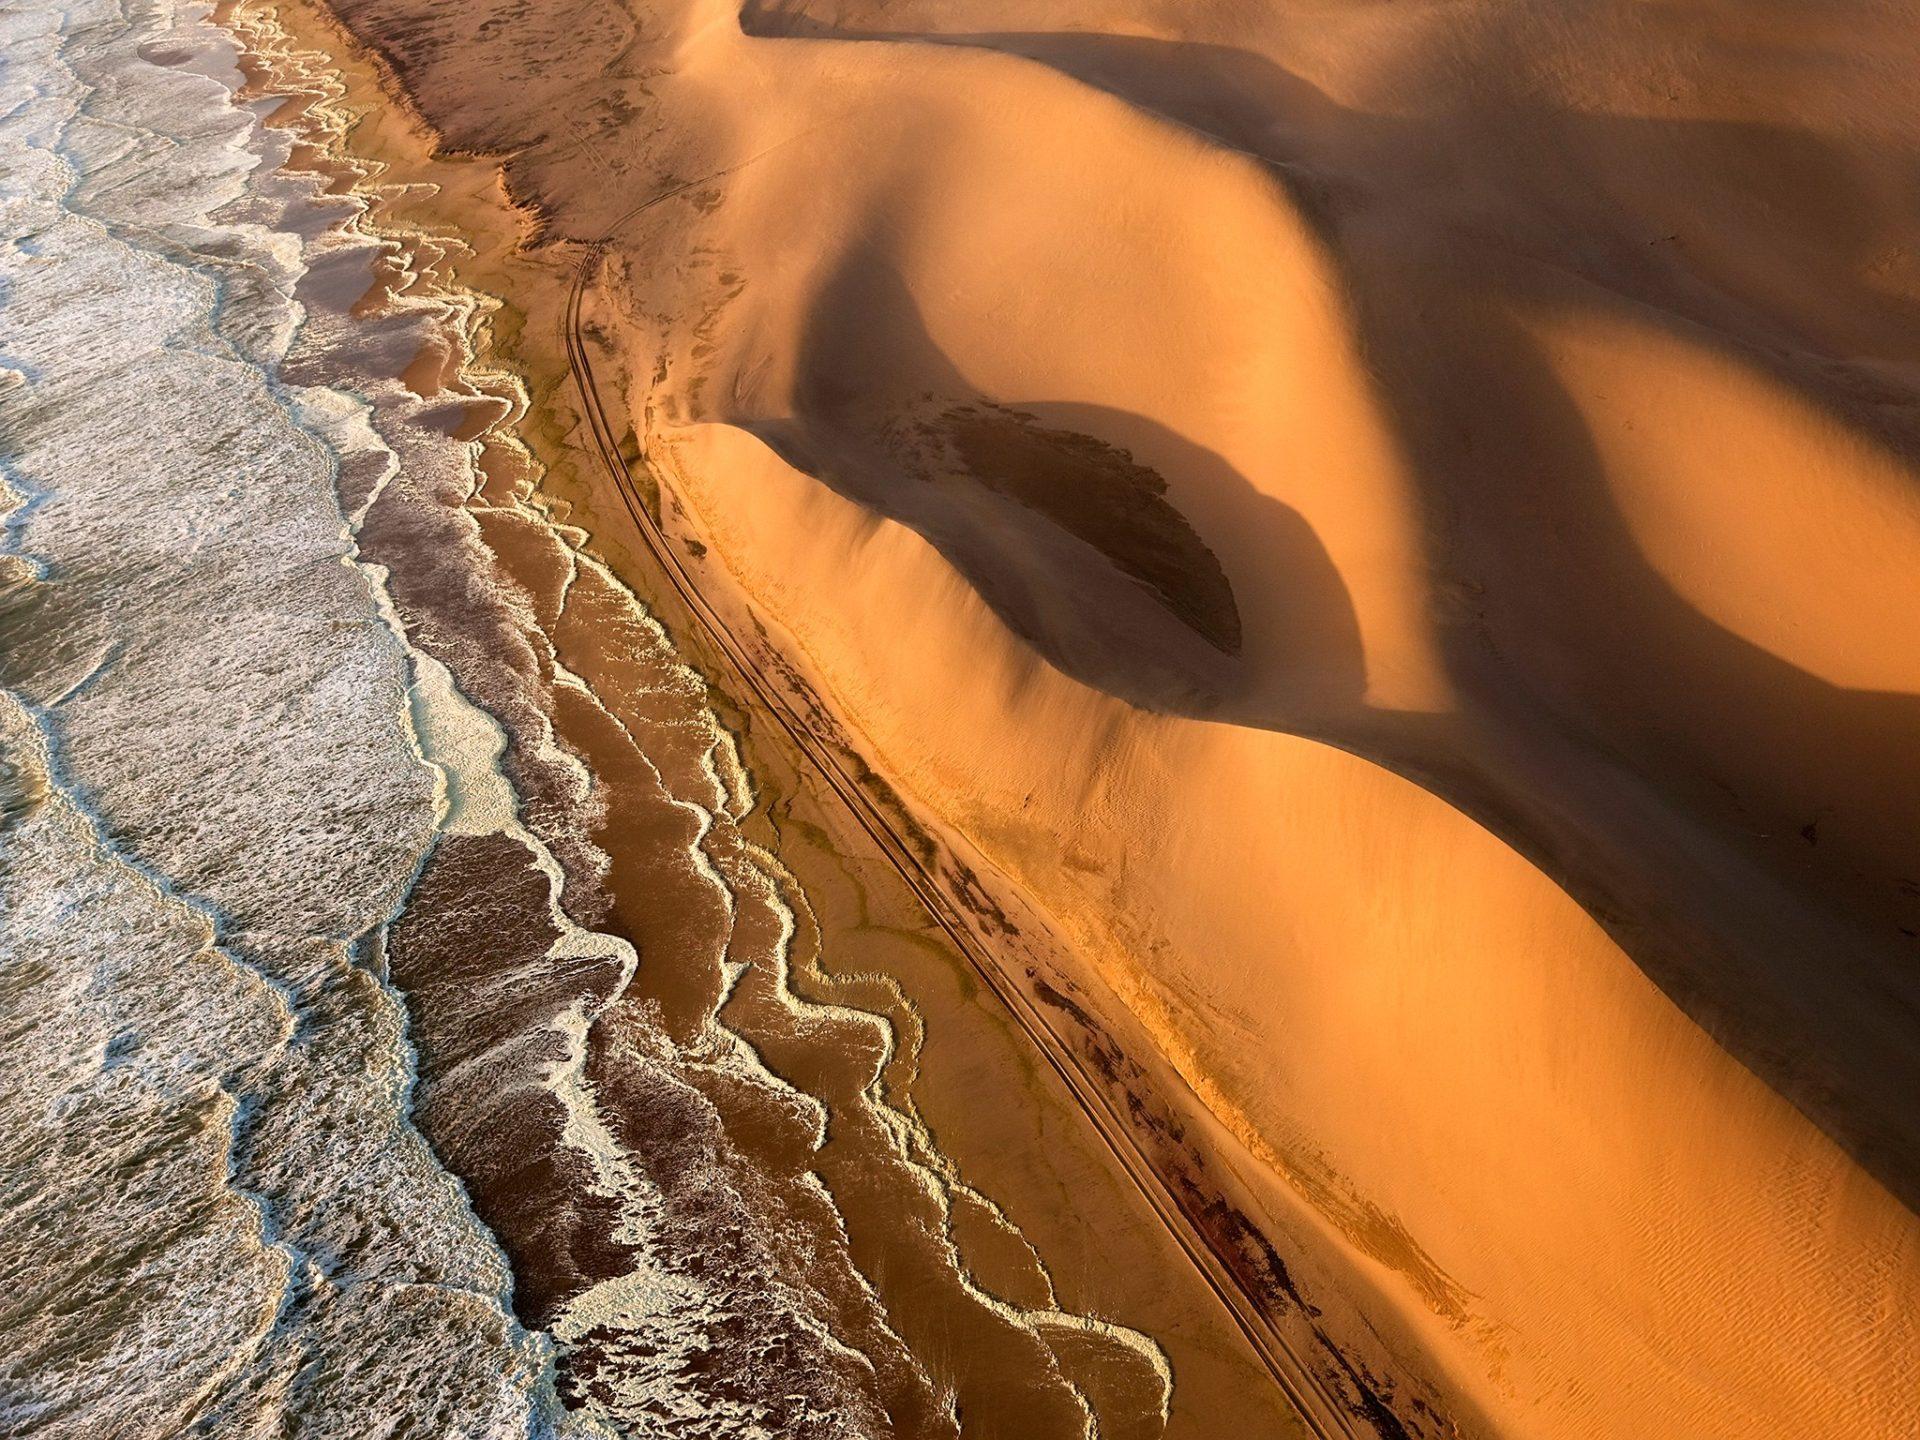 11. Берег скелетов, Намибия.